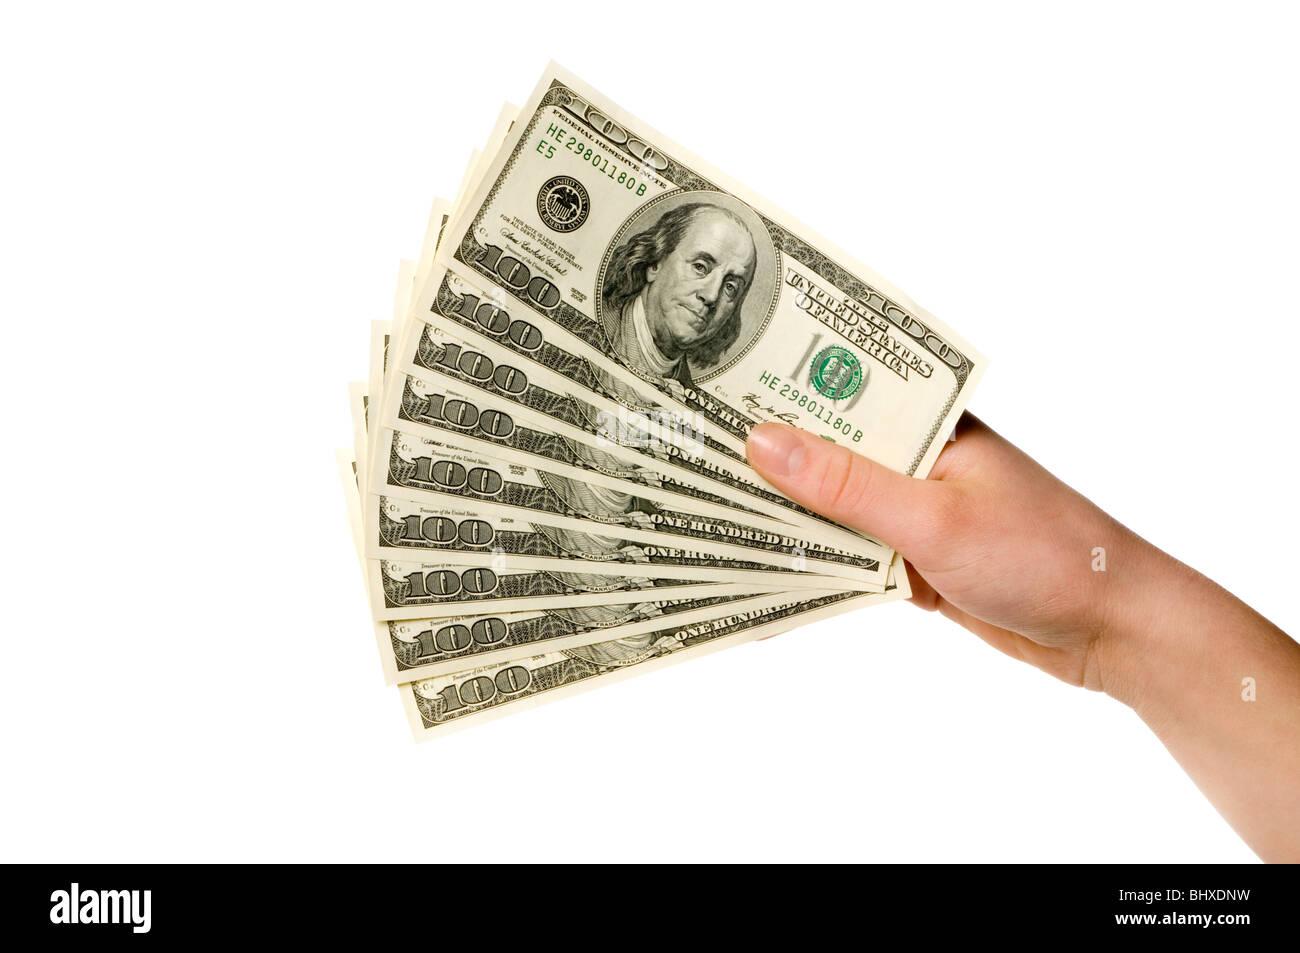 hand holding money - Stock Image